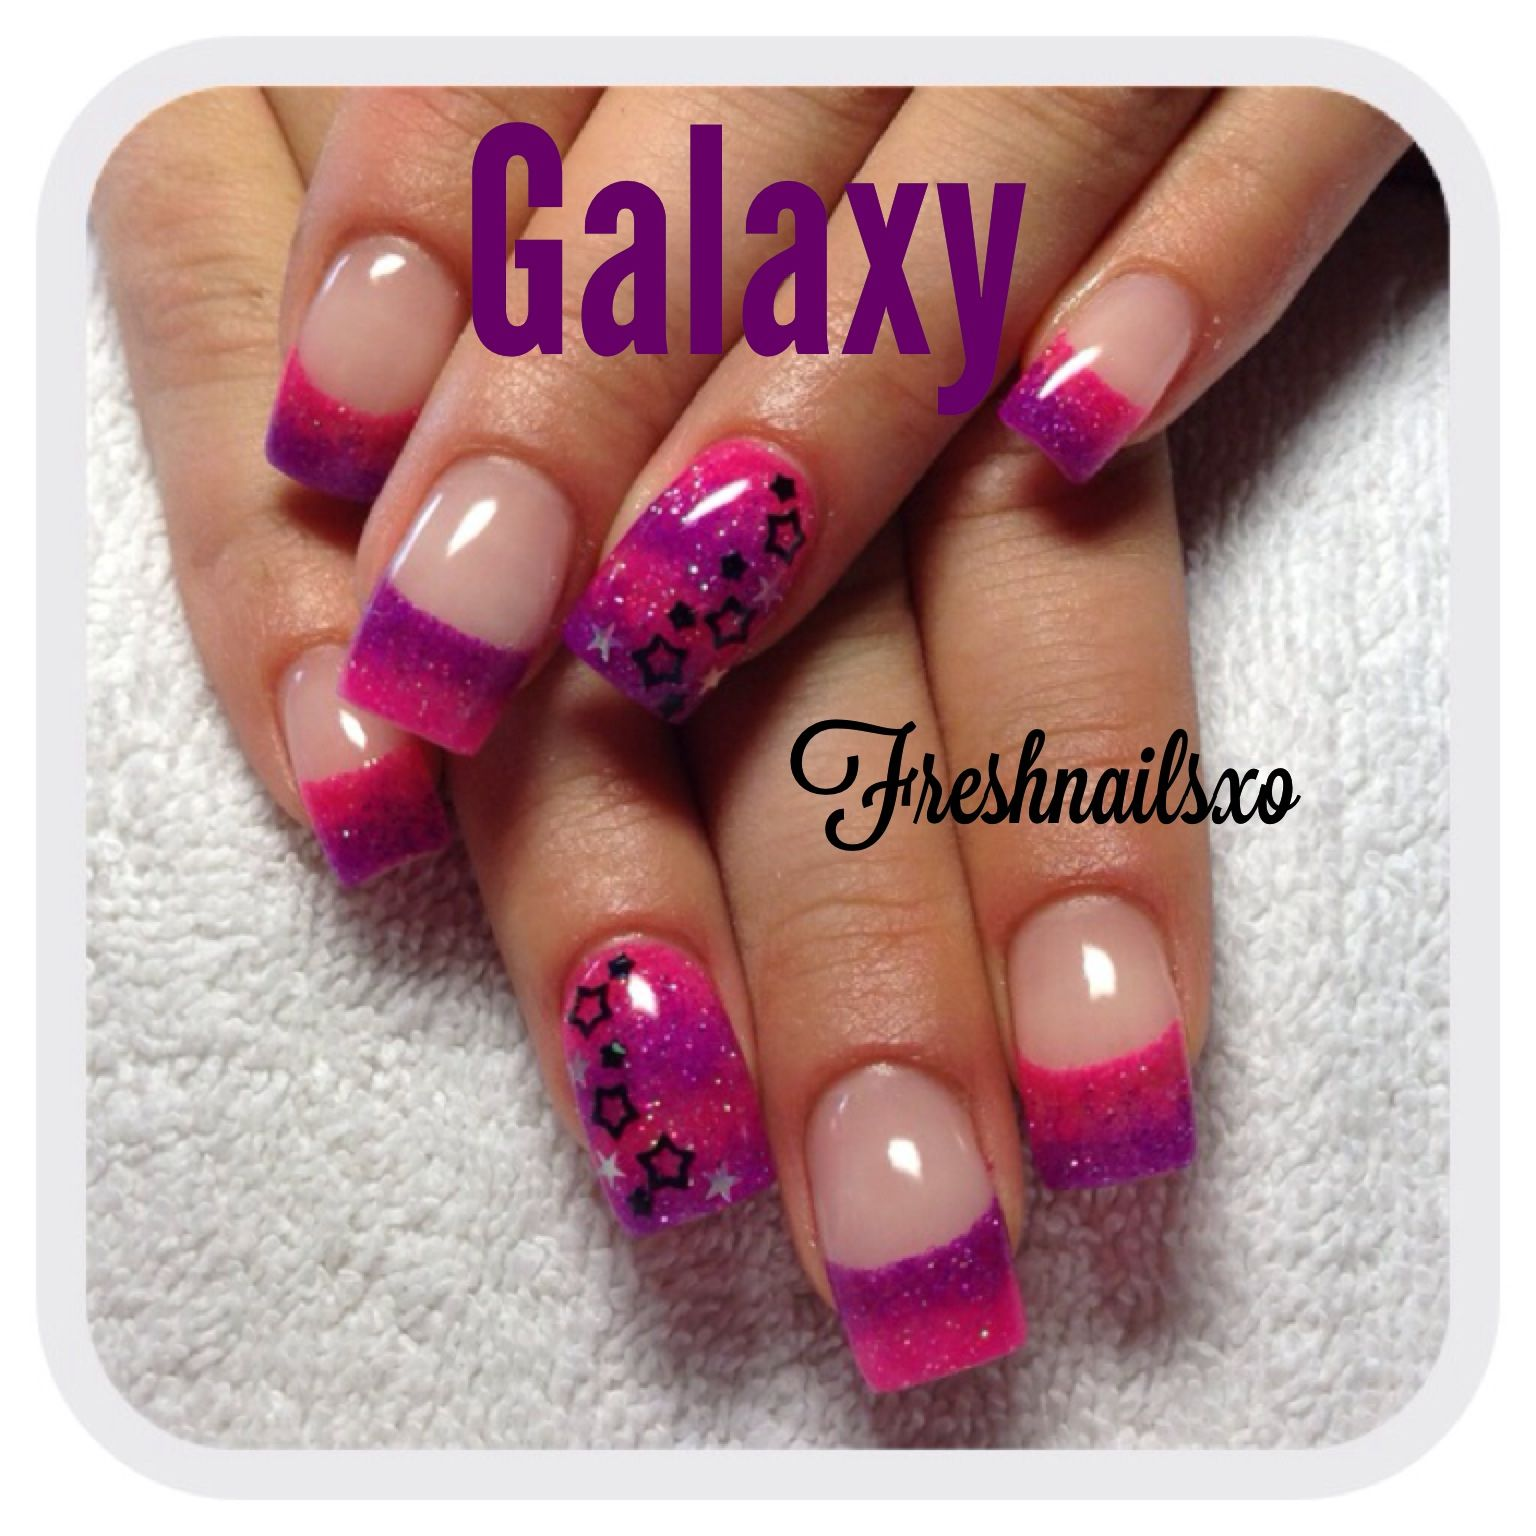 Neon pink | neon purple | stars | galaxy nails | gel nails | nails ...